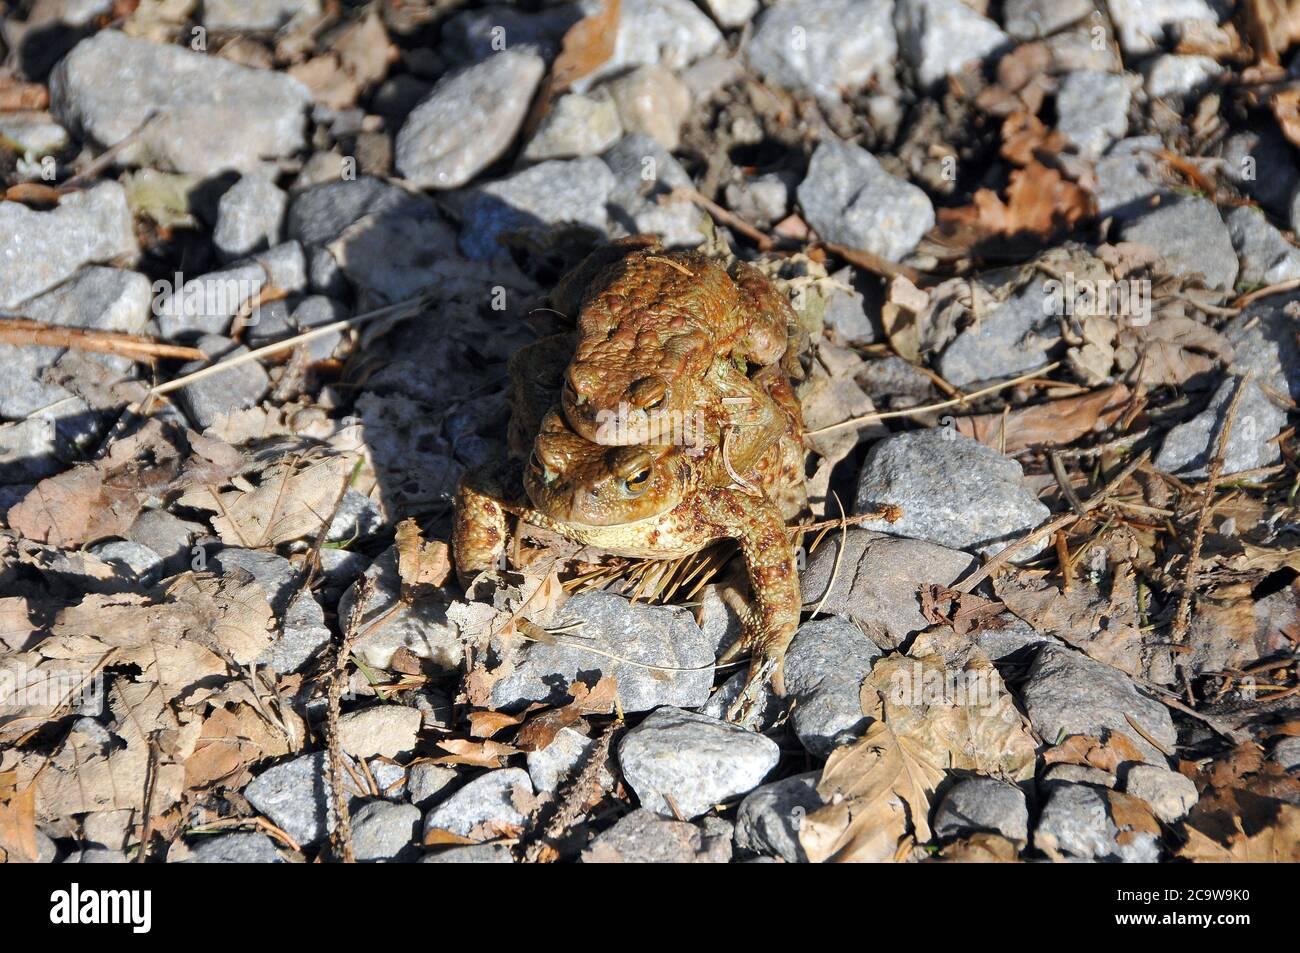 Common toad, European toad, Erdkröte, Bufo bufo, barna varangy Stock Photo